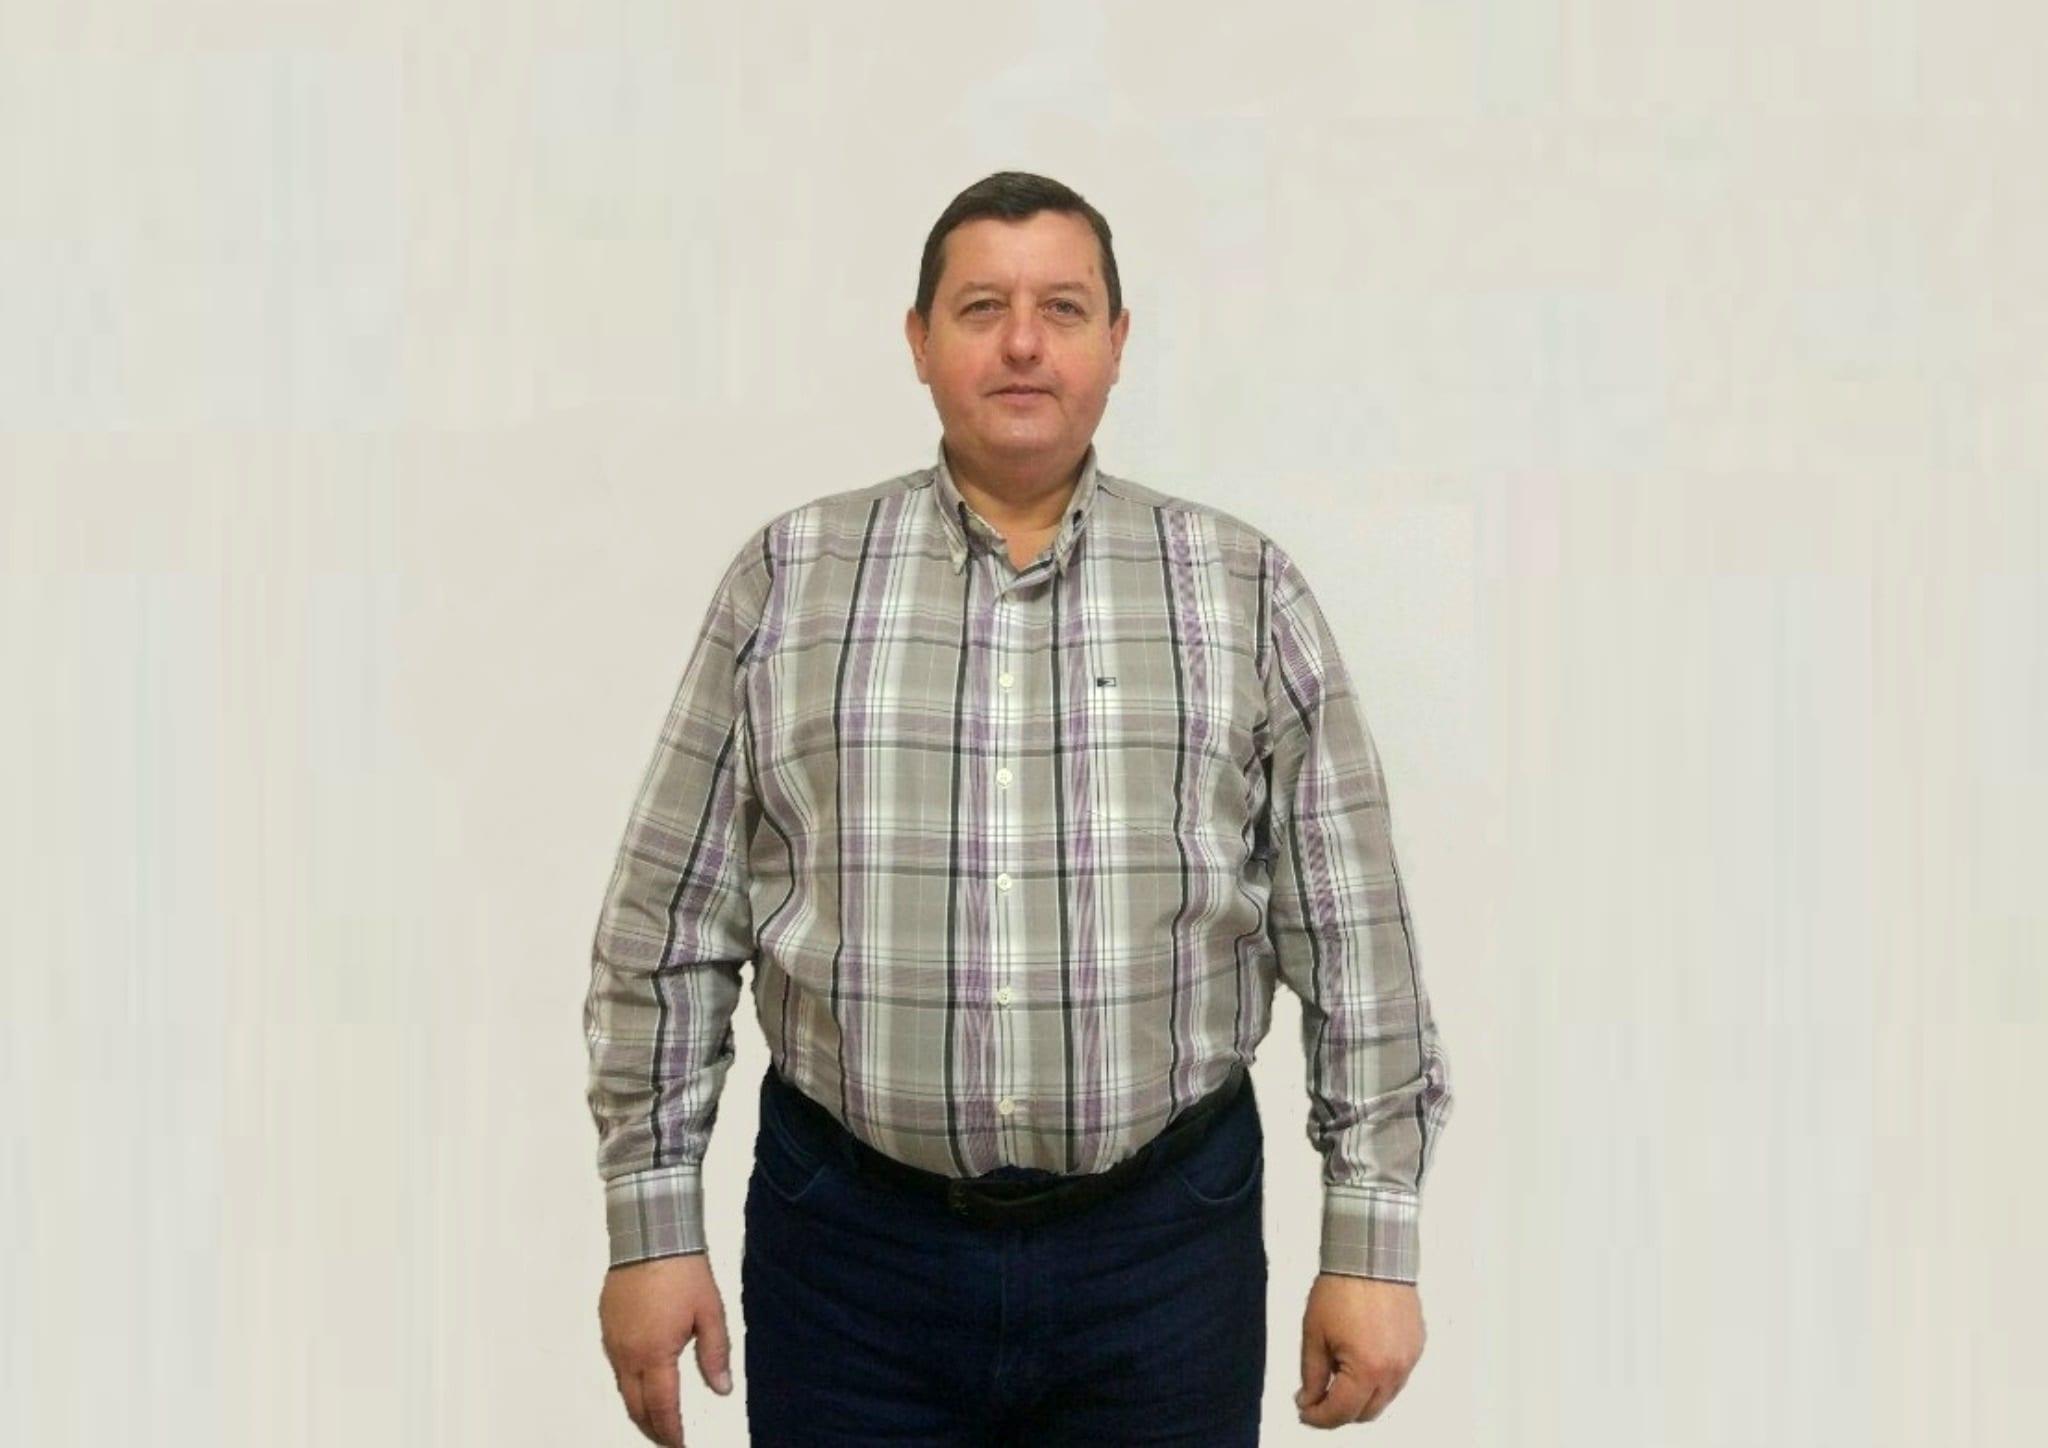 Oleg Iachin